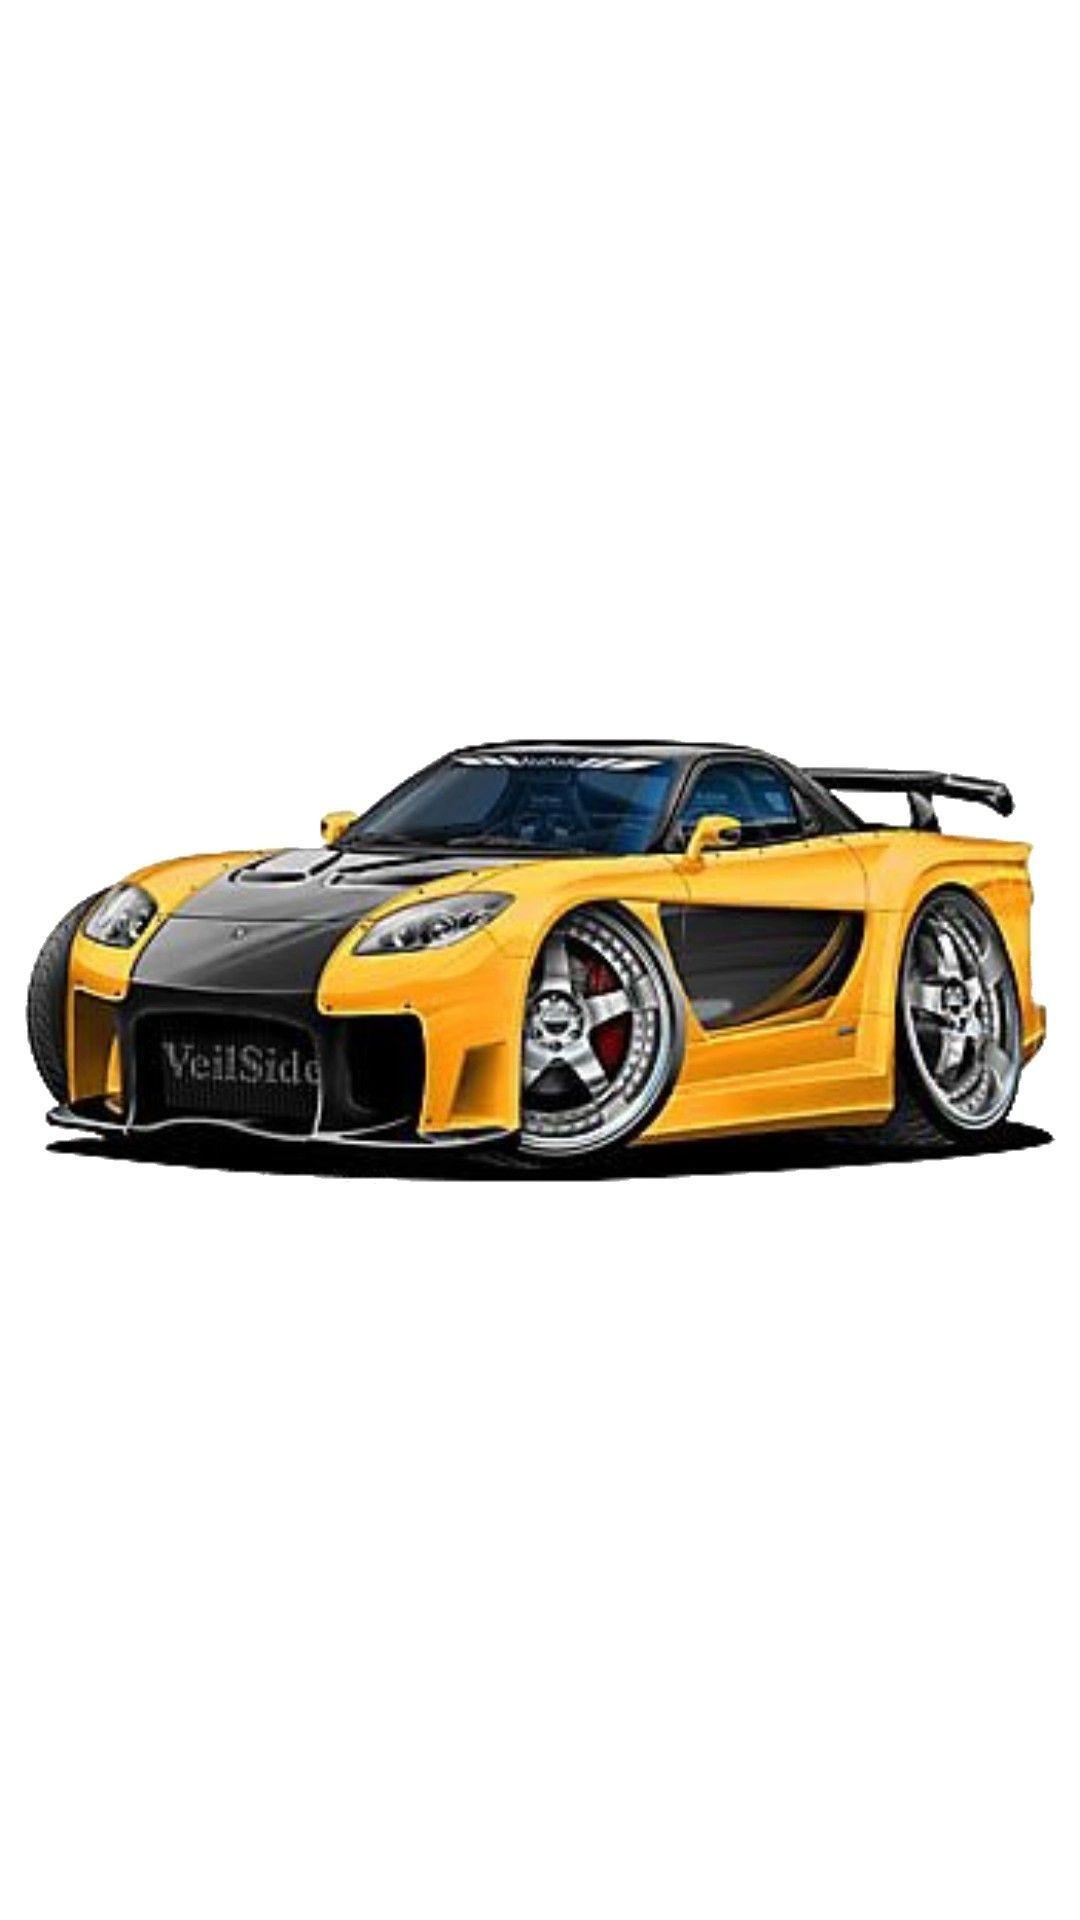 Modifiedcarart In 2020 Car Collection Car Cartoon Automotive Art